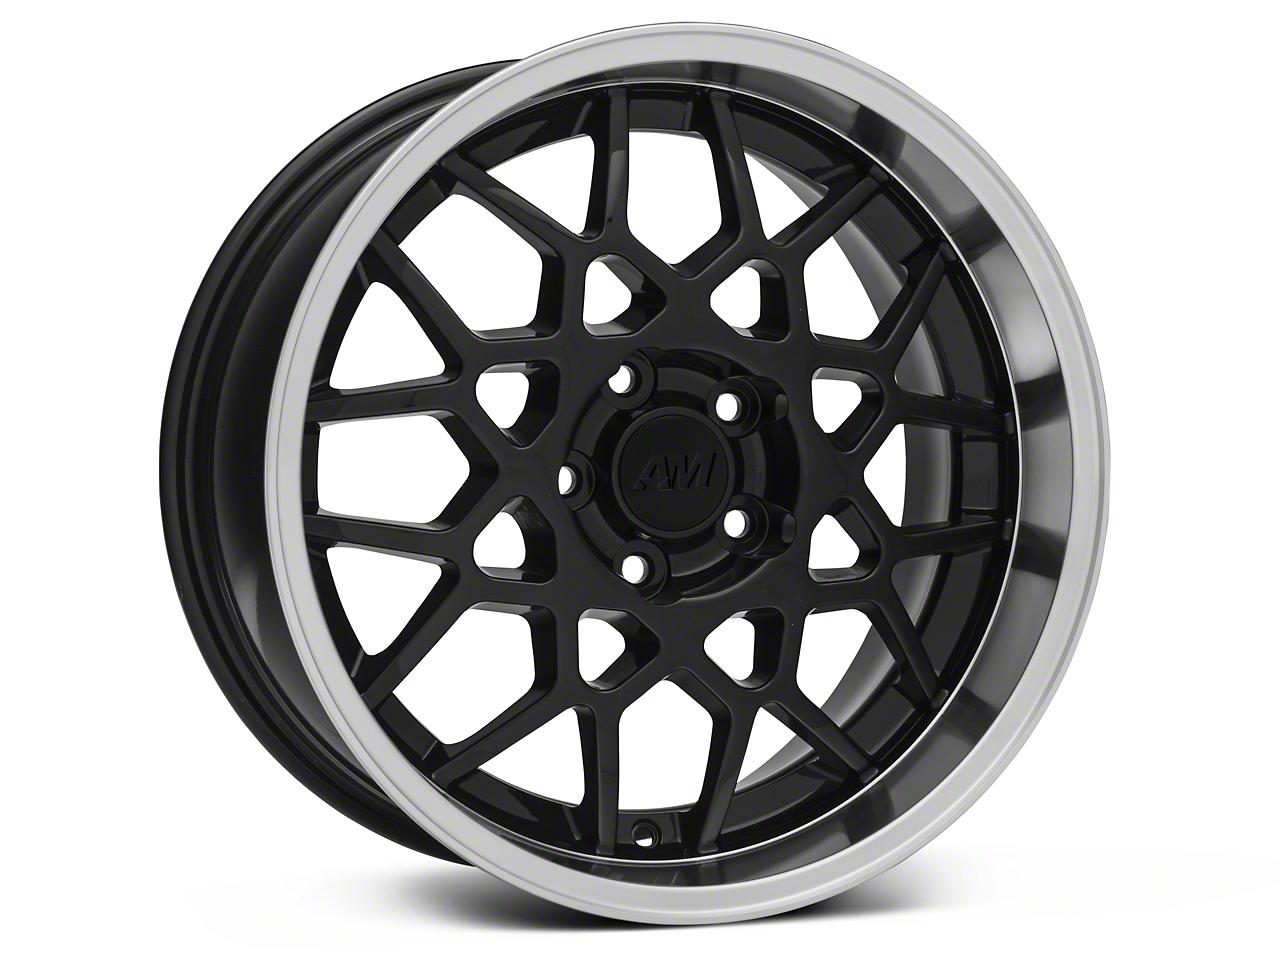 2013 GT500 Style Deep Dish Black Wheel - 18x9 (05-09 GT, V6)